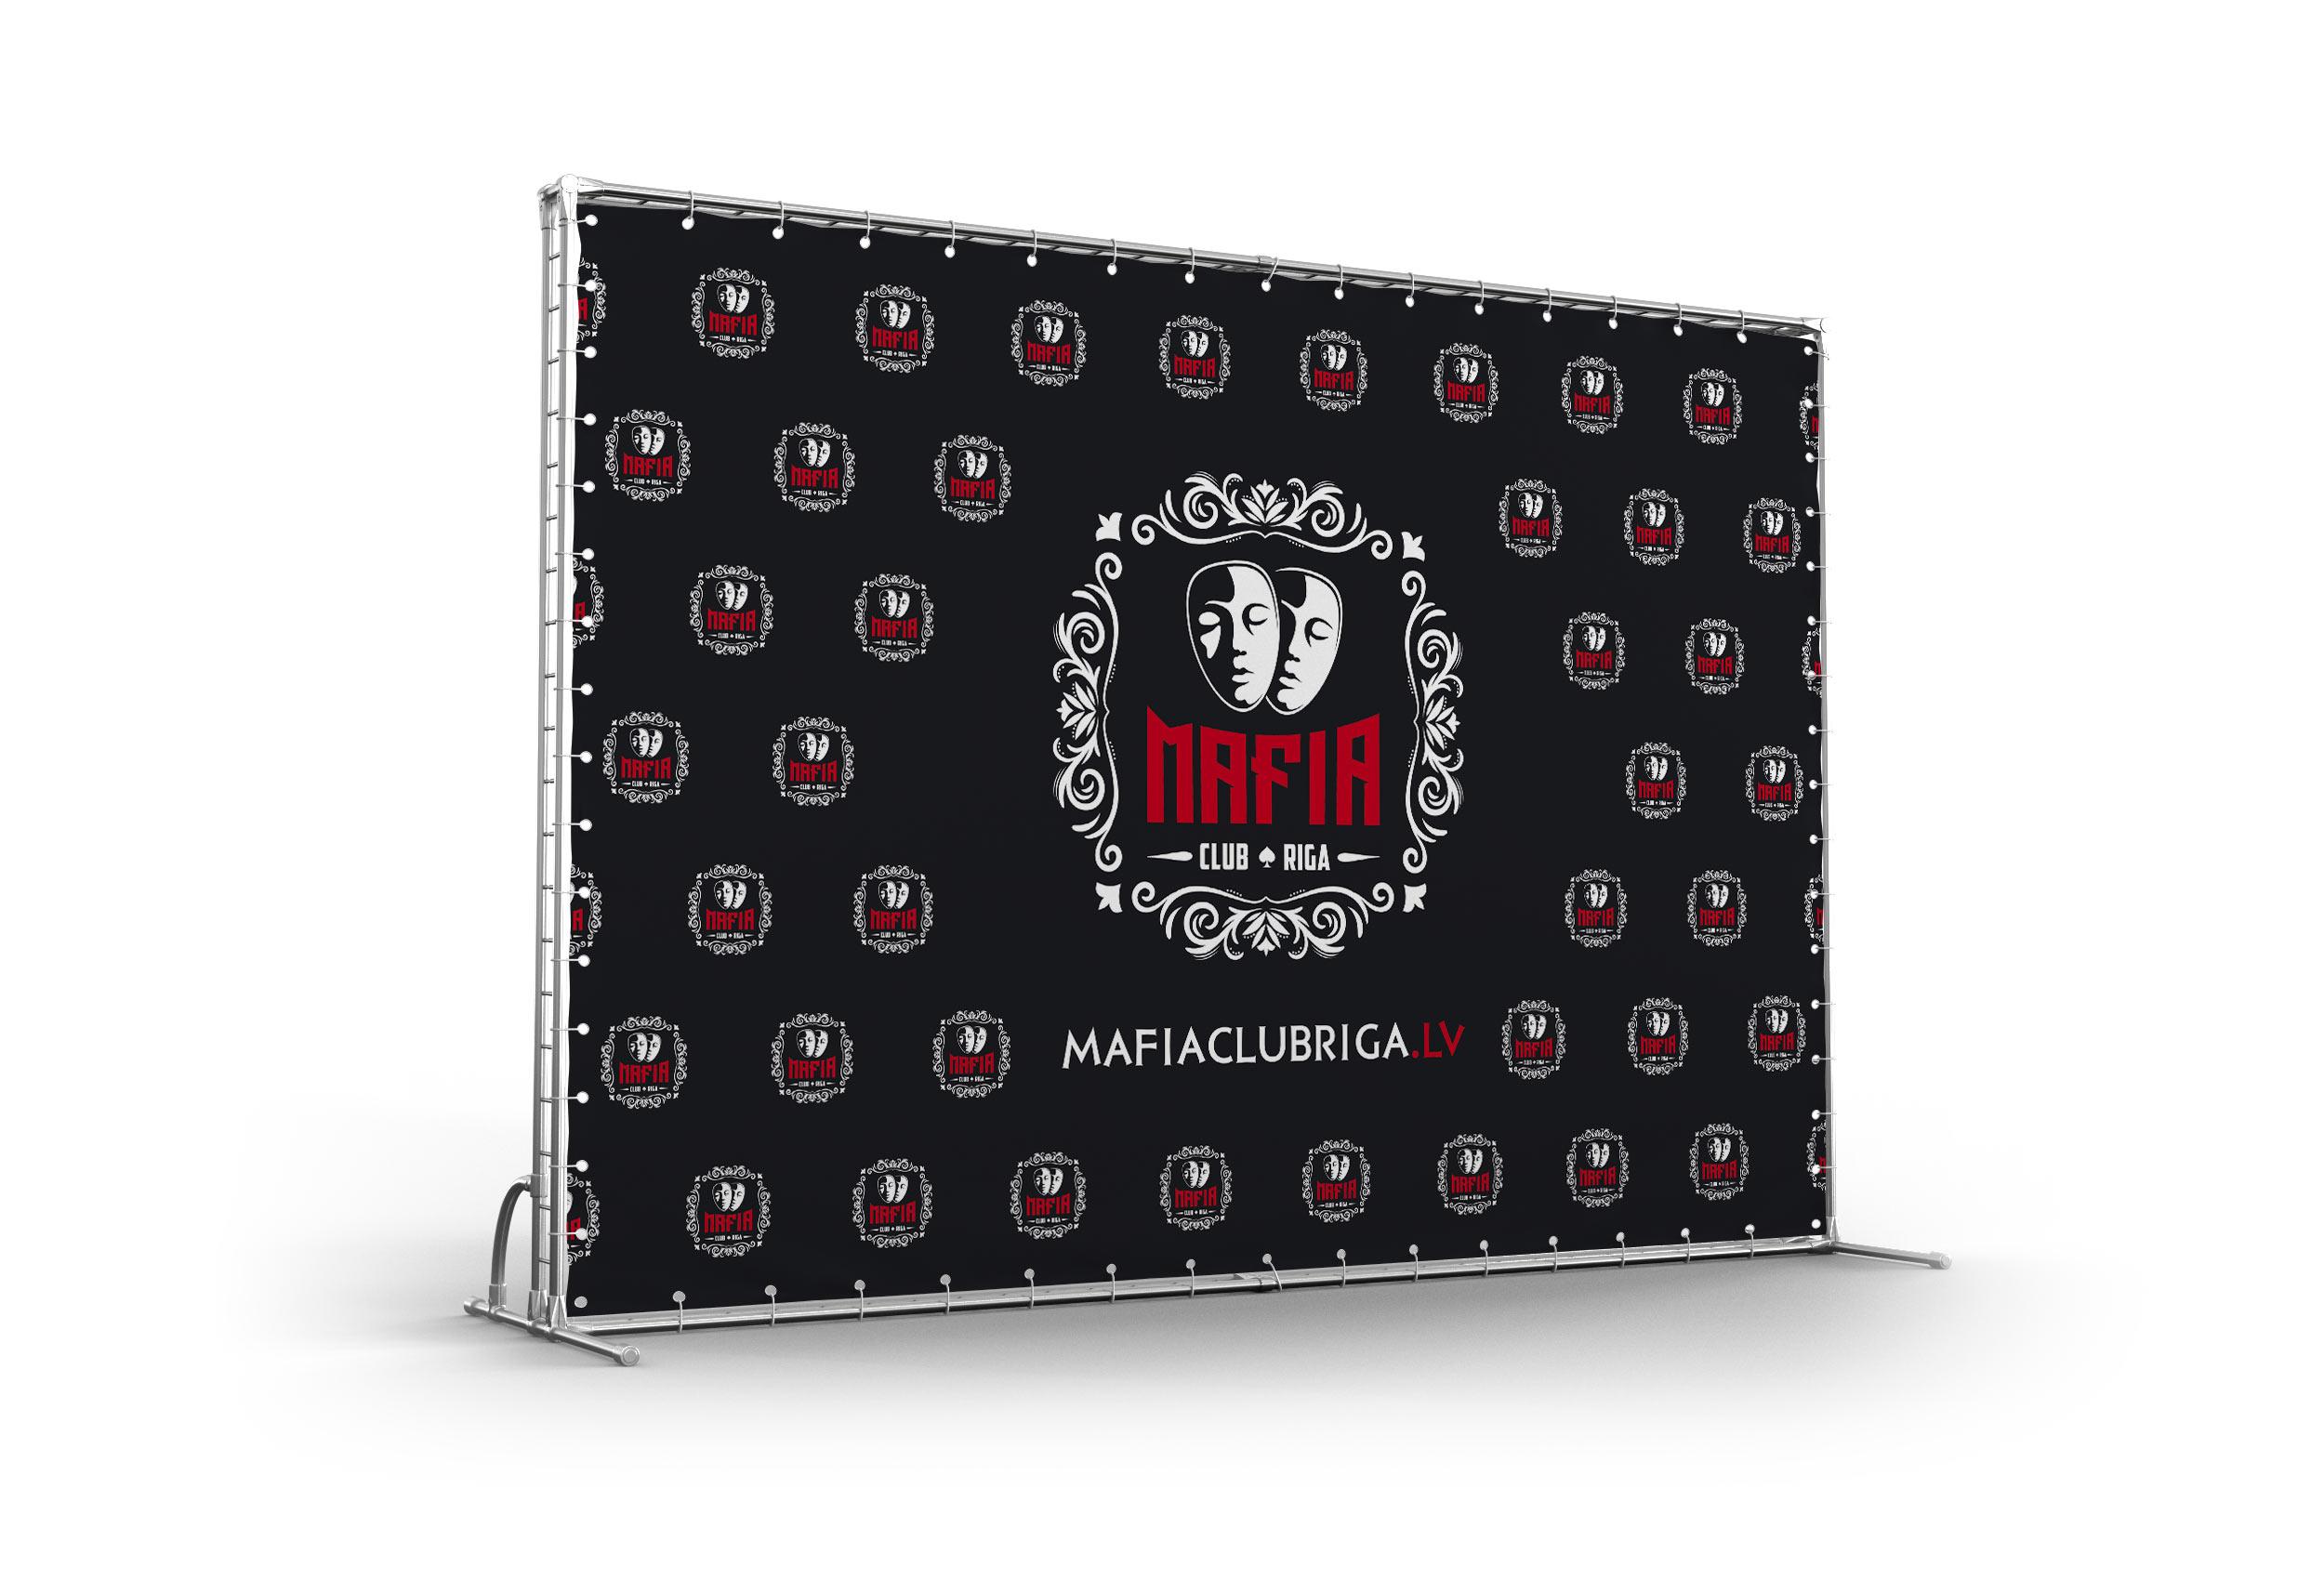 Разработка логотипа и элементов фирменного стиля для «Mafia Club Riga»